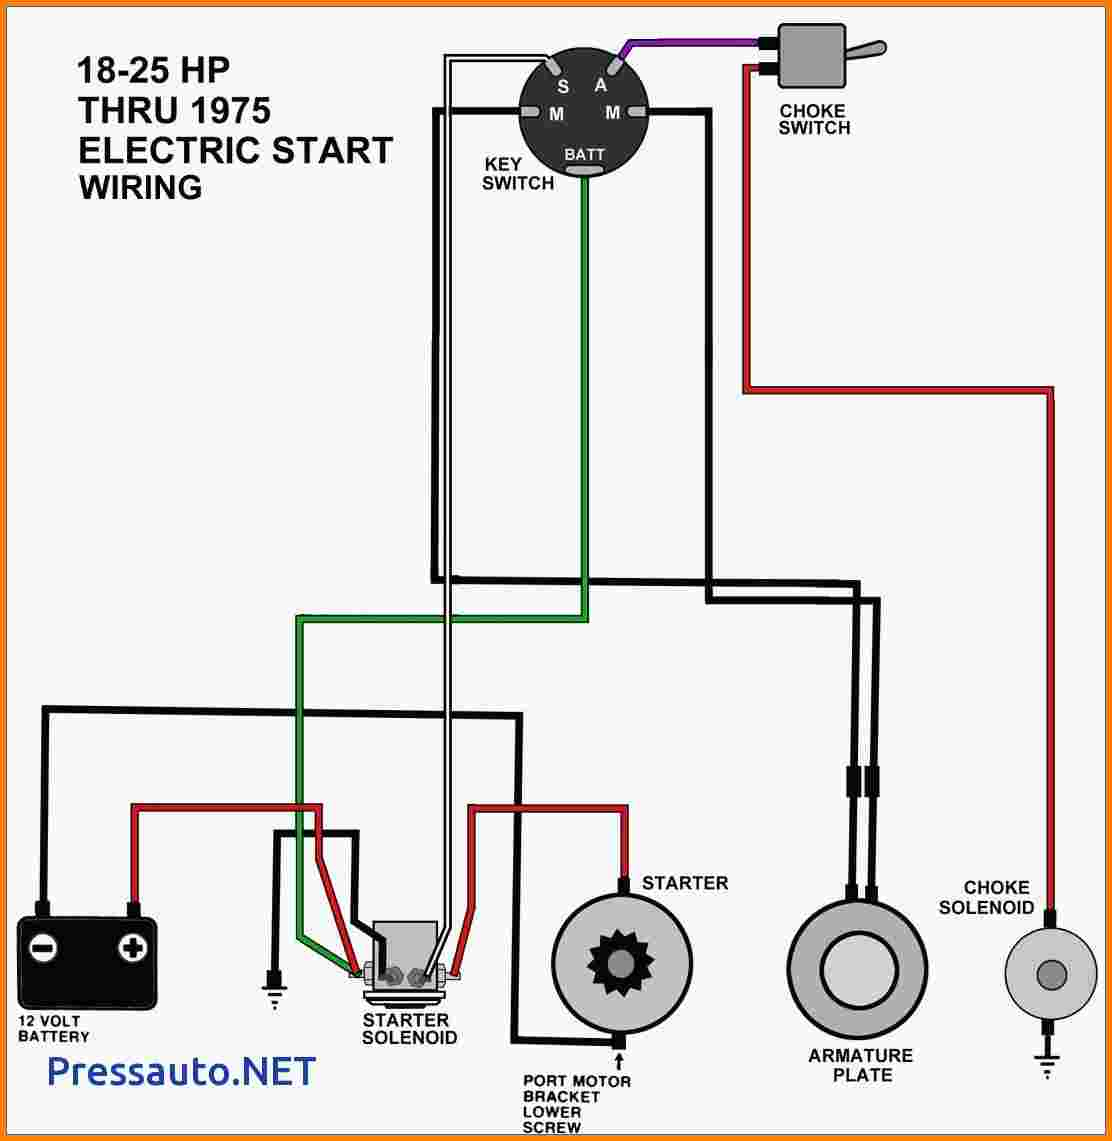 Briggs Amp Stratton Kill Switch Wiring Diagram | Wiring Diagram - Briggs And Stratton Coil Wiring Diagram